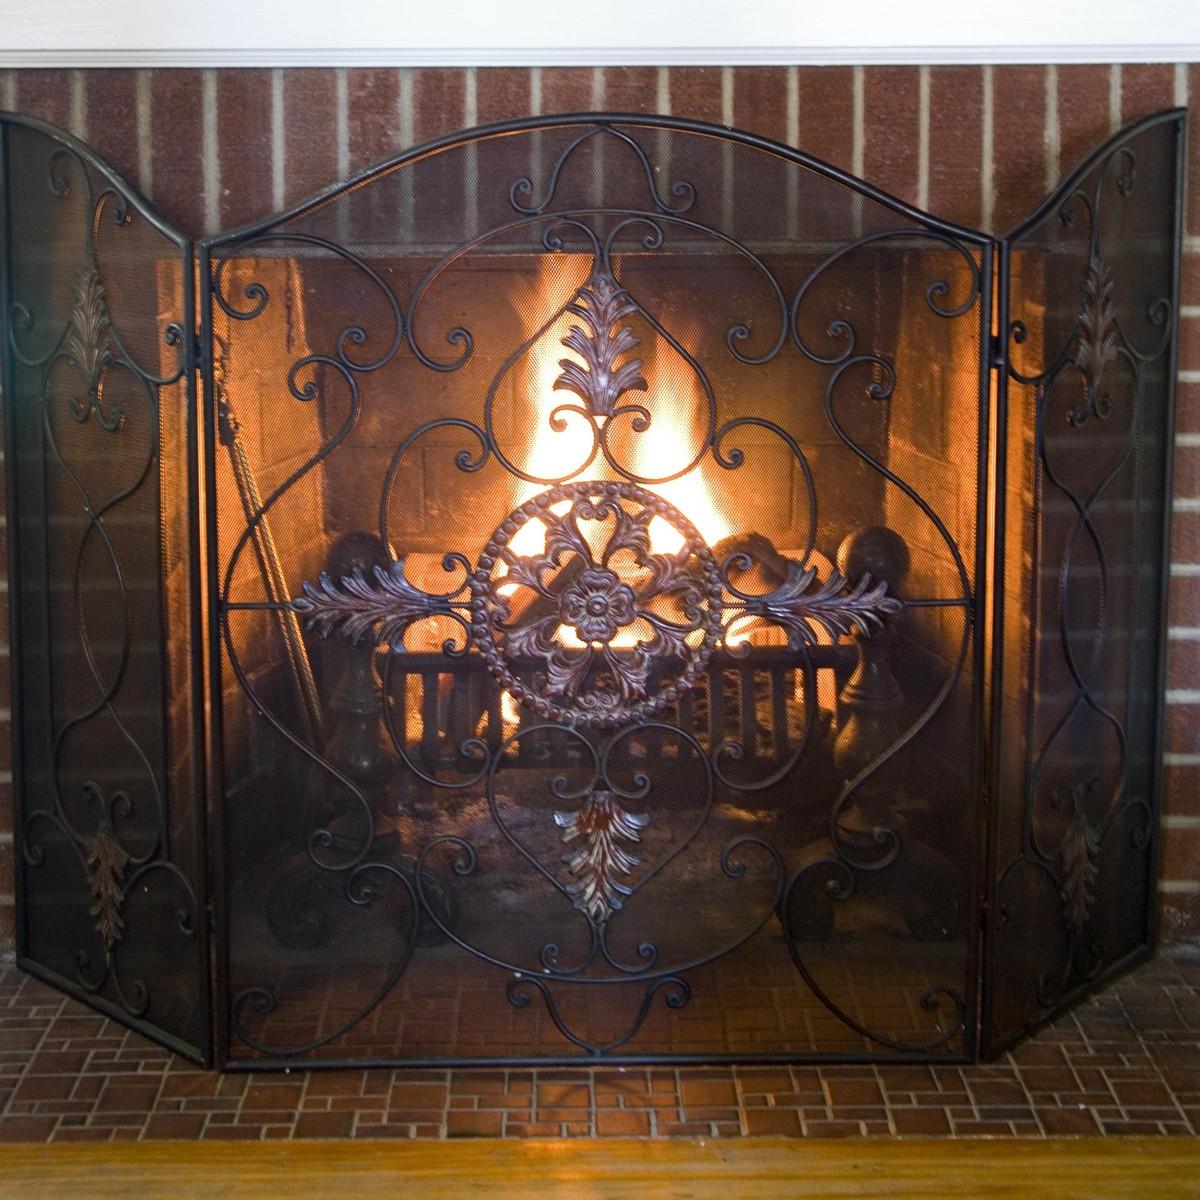 Stupell yorkie dog 3 panel decorative fireplace screen - Stupell Yorkie Dog 3 Panel Decorative Fireplace Screen Stupell Yorkie Dog 3 Panel Decorative Fireplace